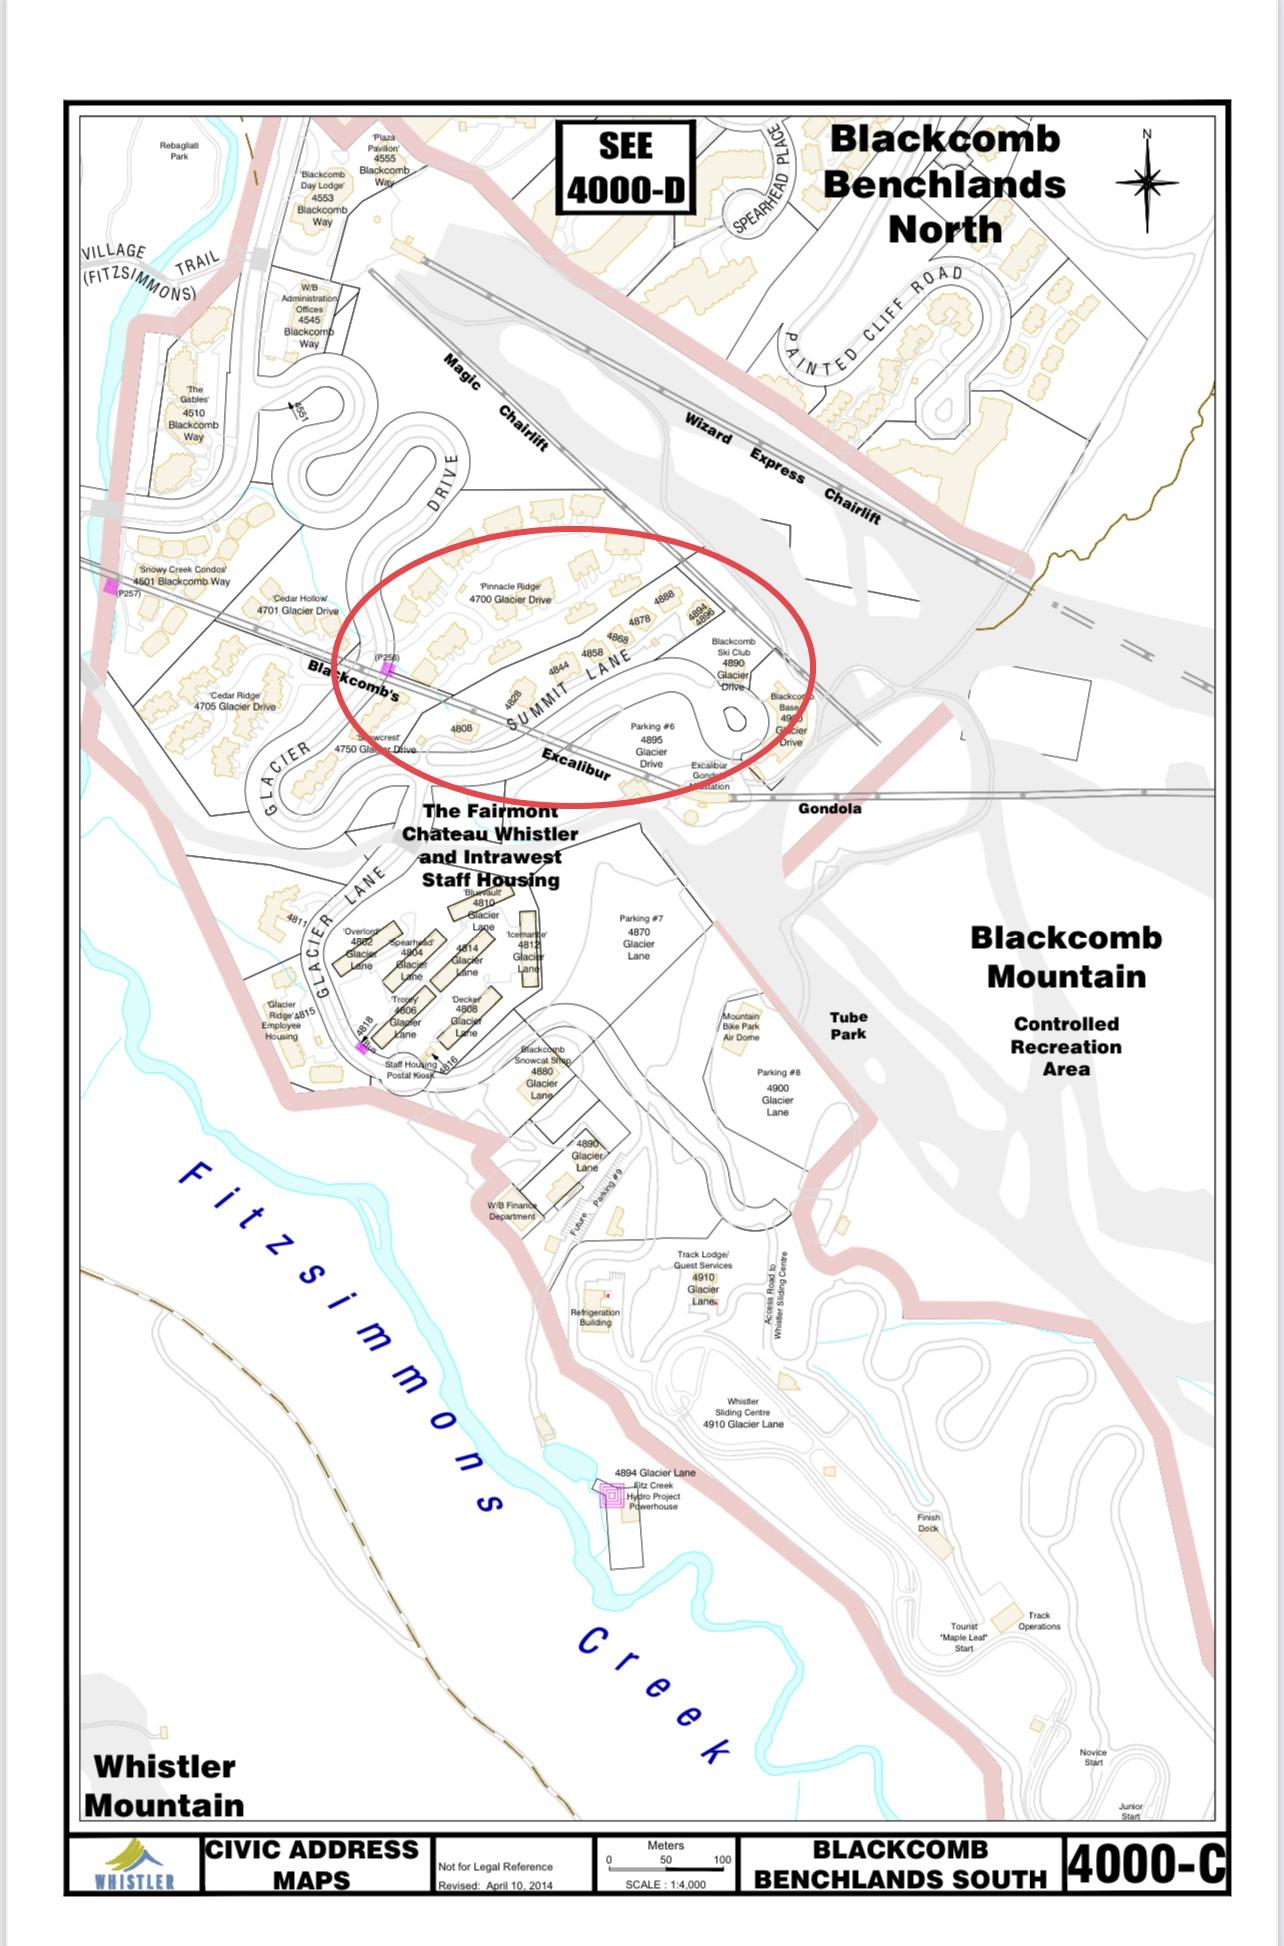 map showing the Summit Lane Civic Address